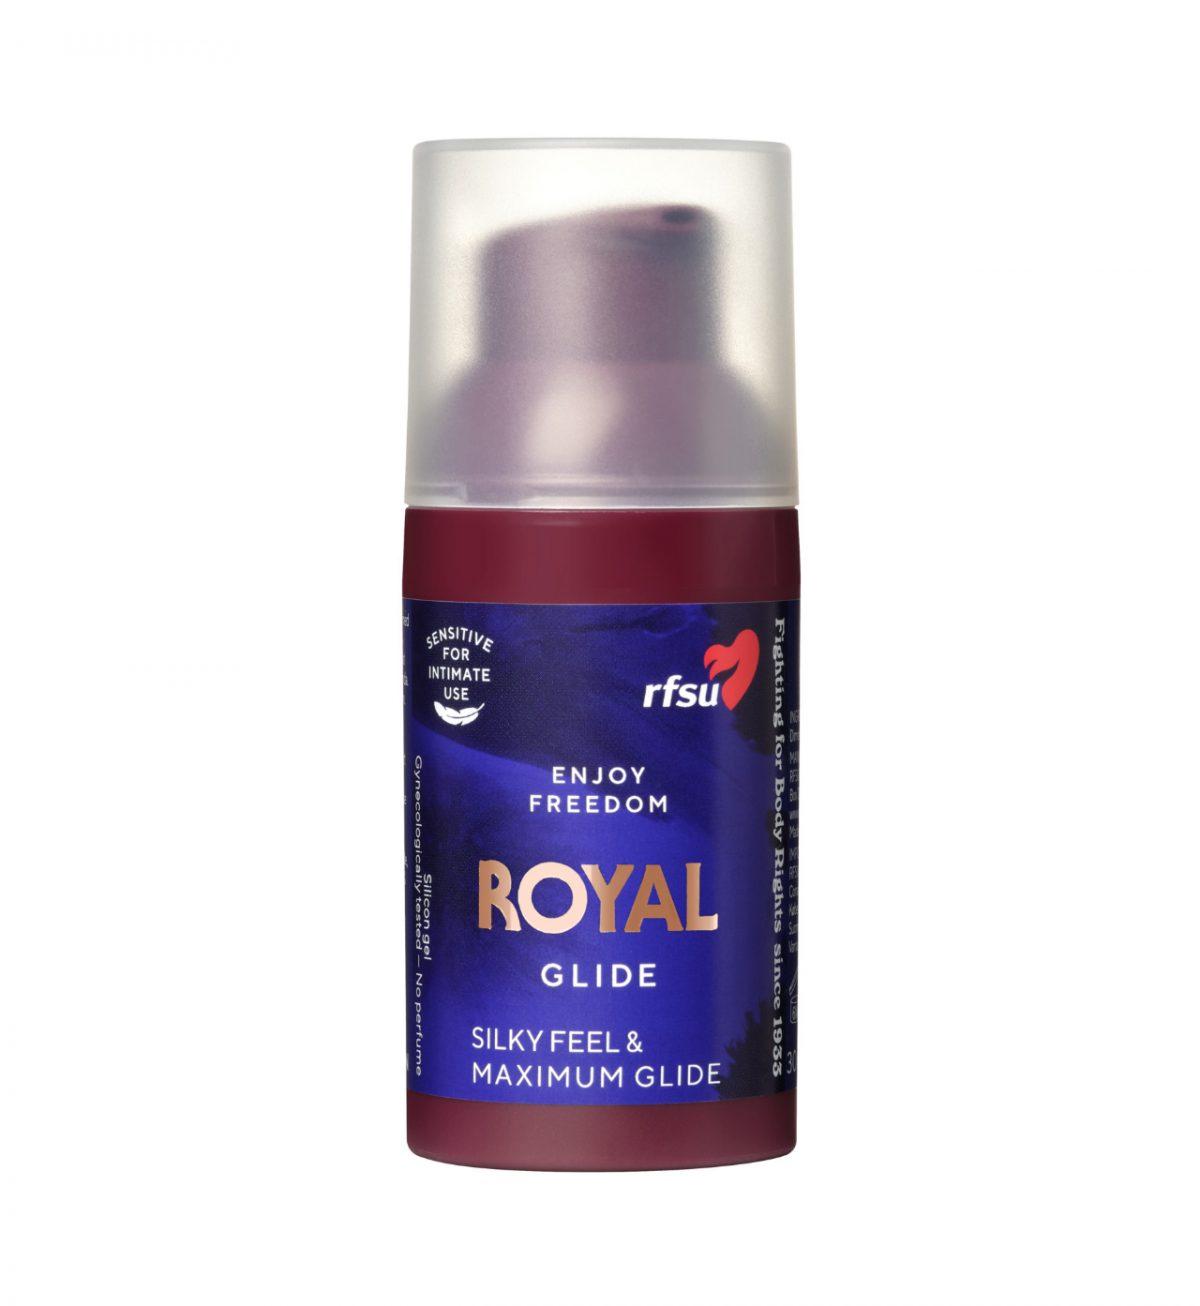 Royal Silk Glide 30ml - LUKSURIØST SILIKONBASERT GLIDEMIDDEL - RFSU